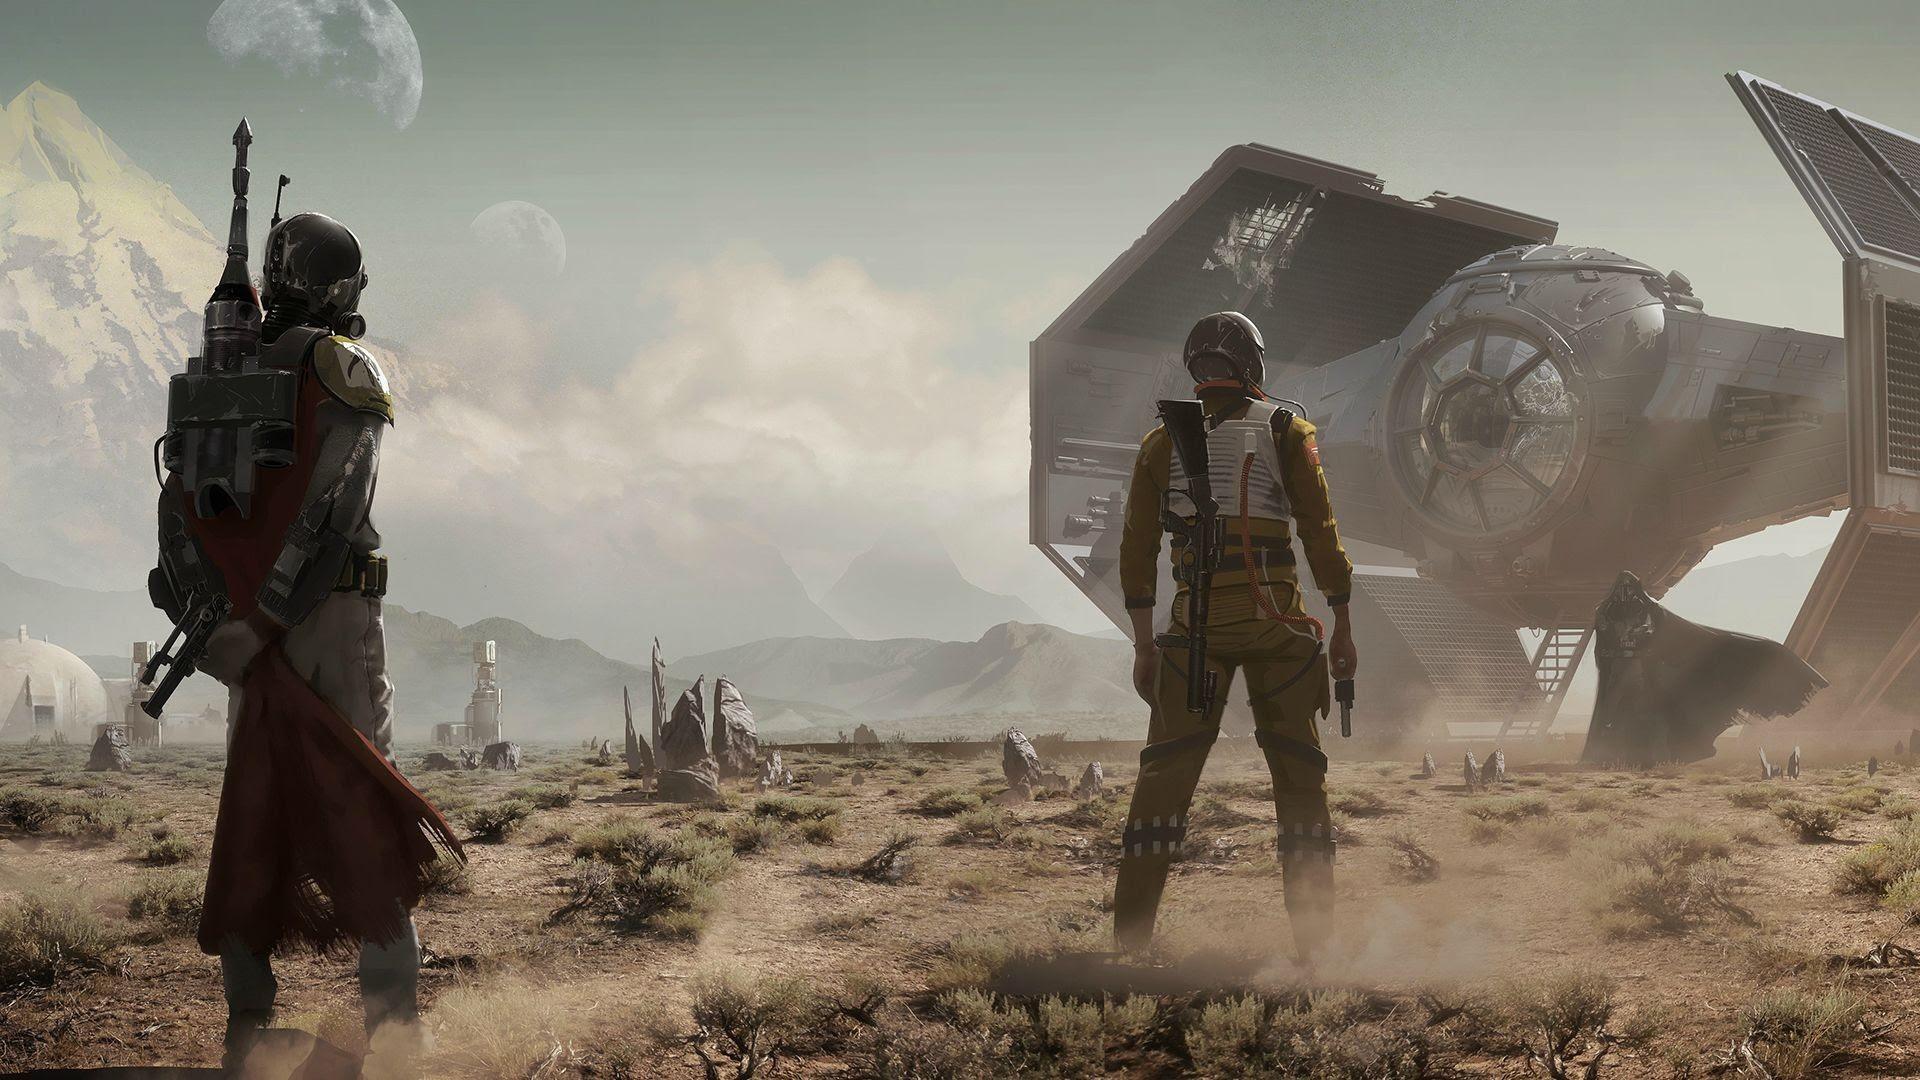 Star Wars Bounty Hunters Wallpaper 69 Images